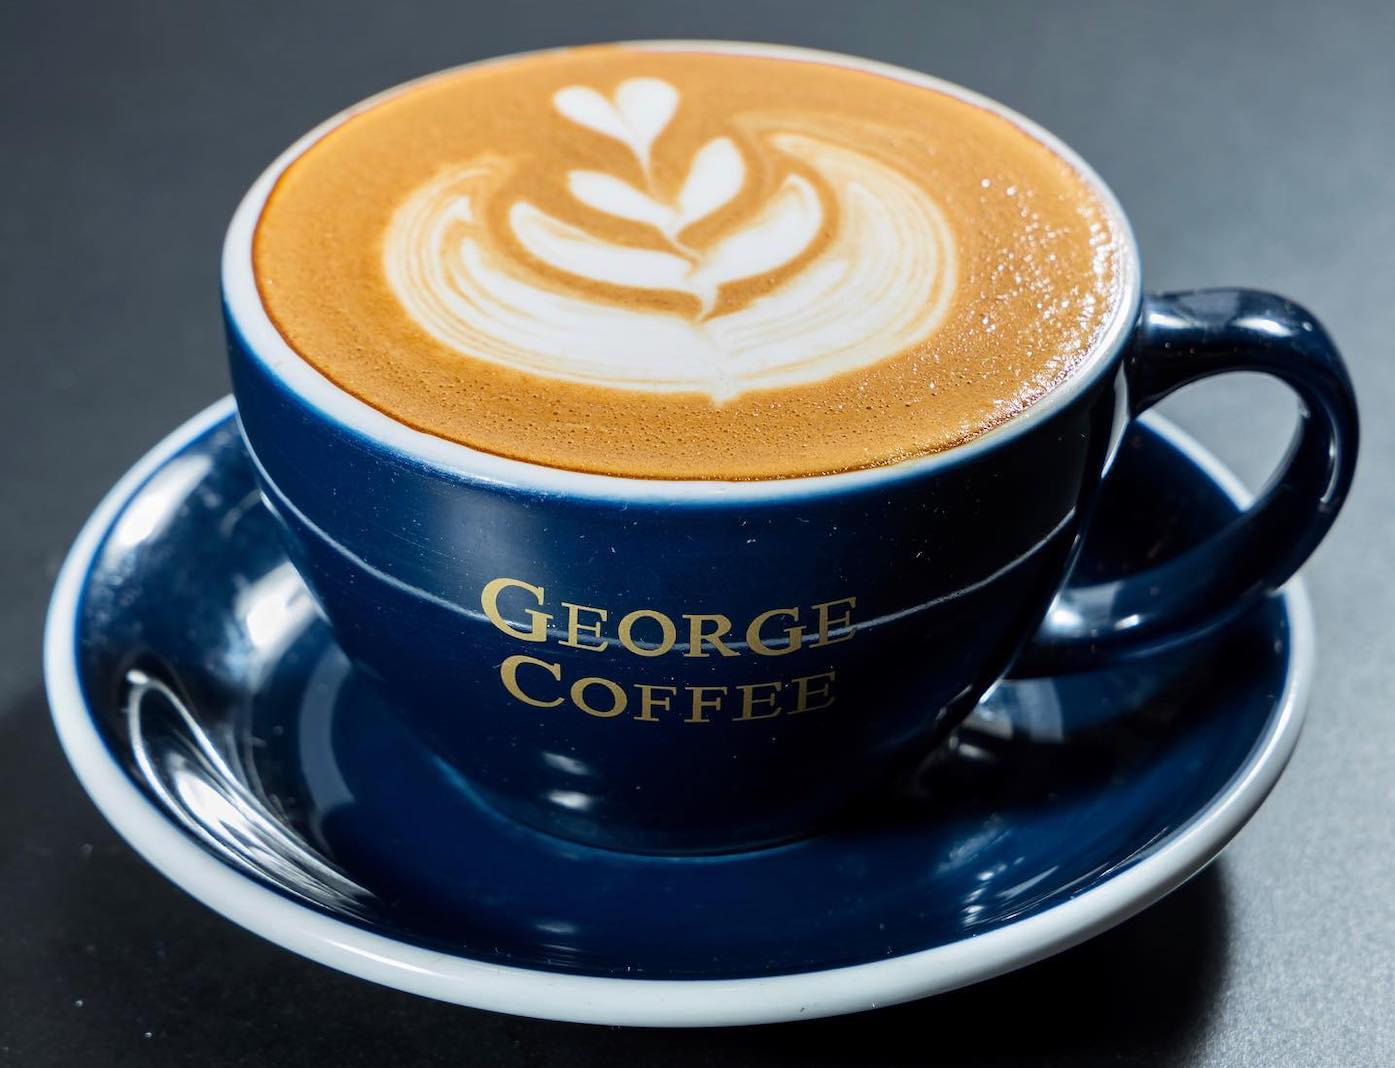 george coffee